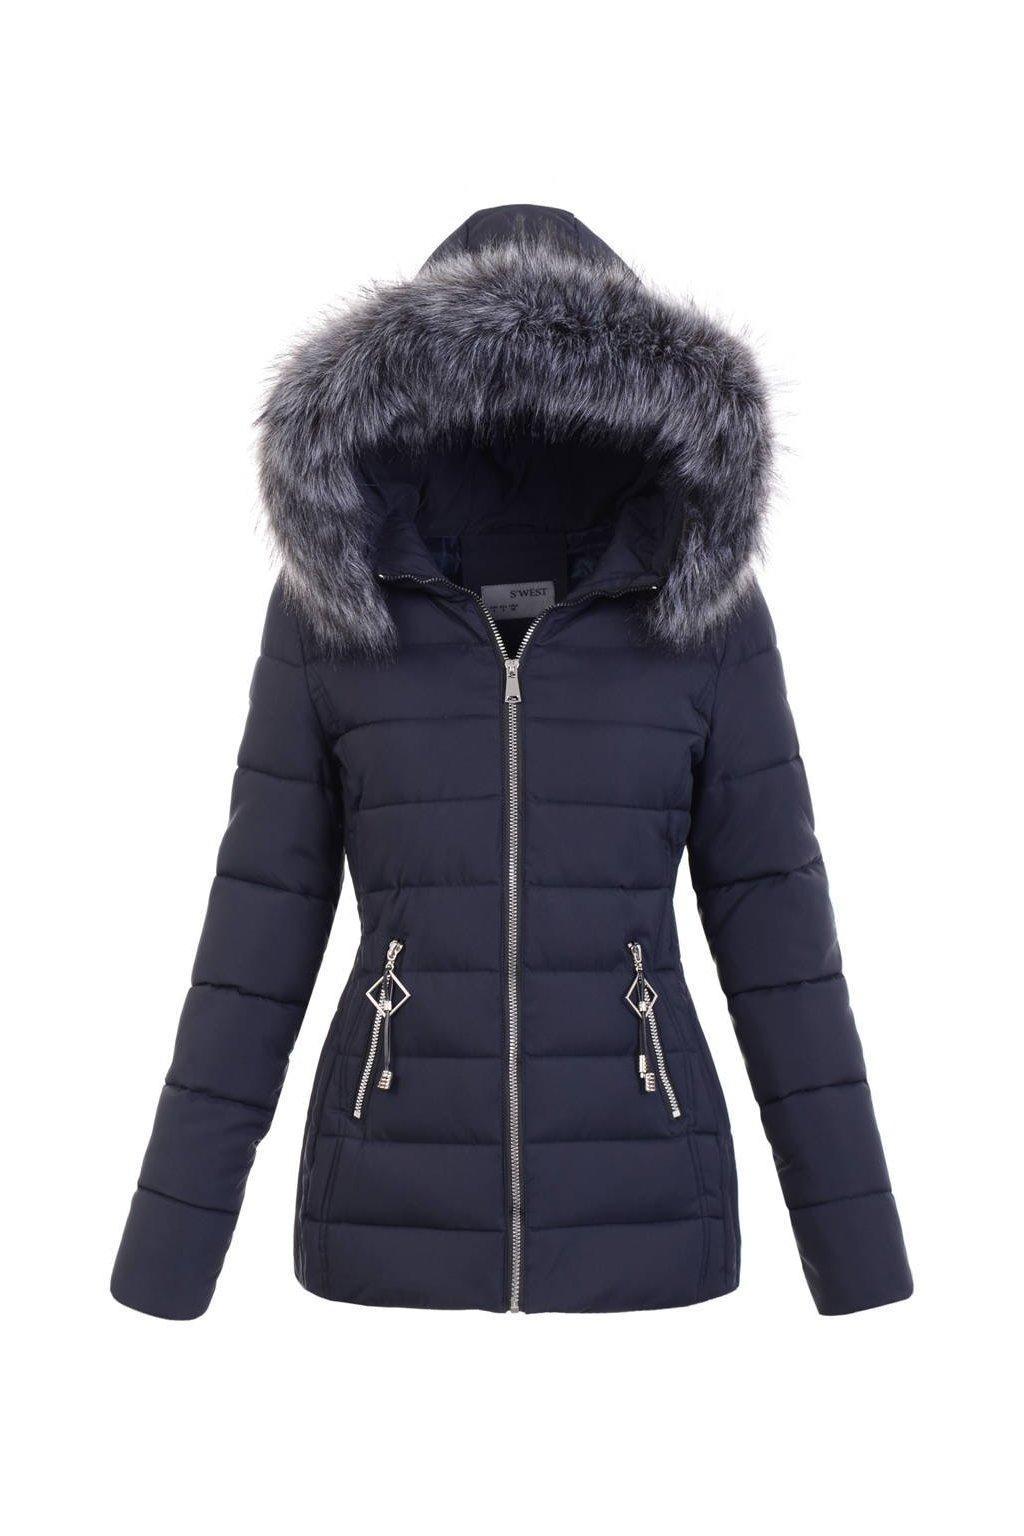 Dámska zimná bunda s kapucňou 6231 modrá